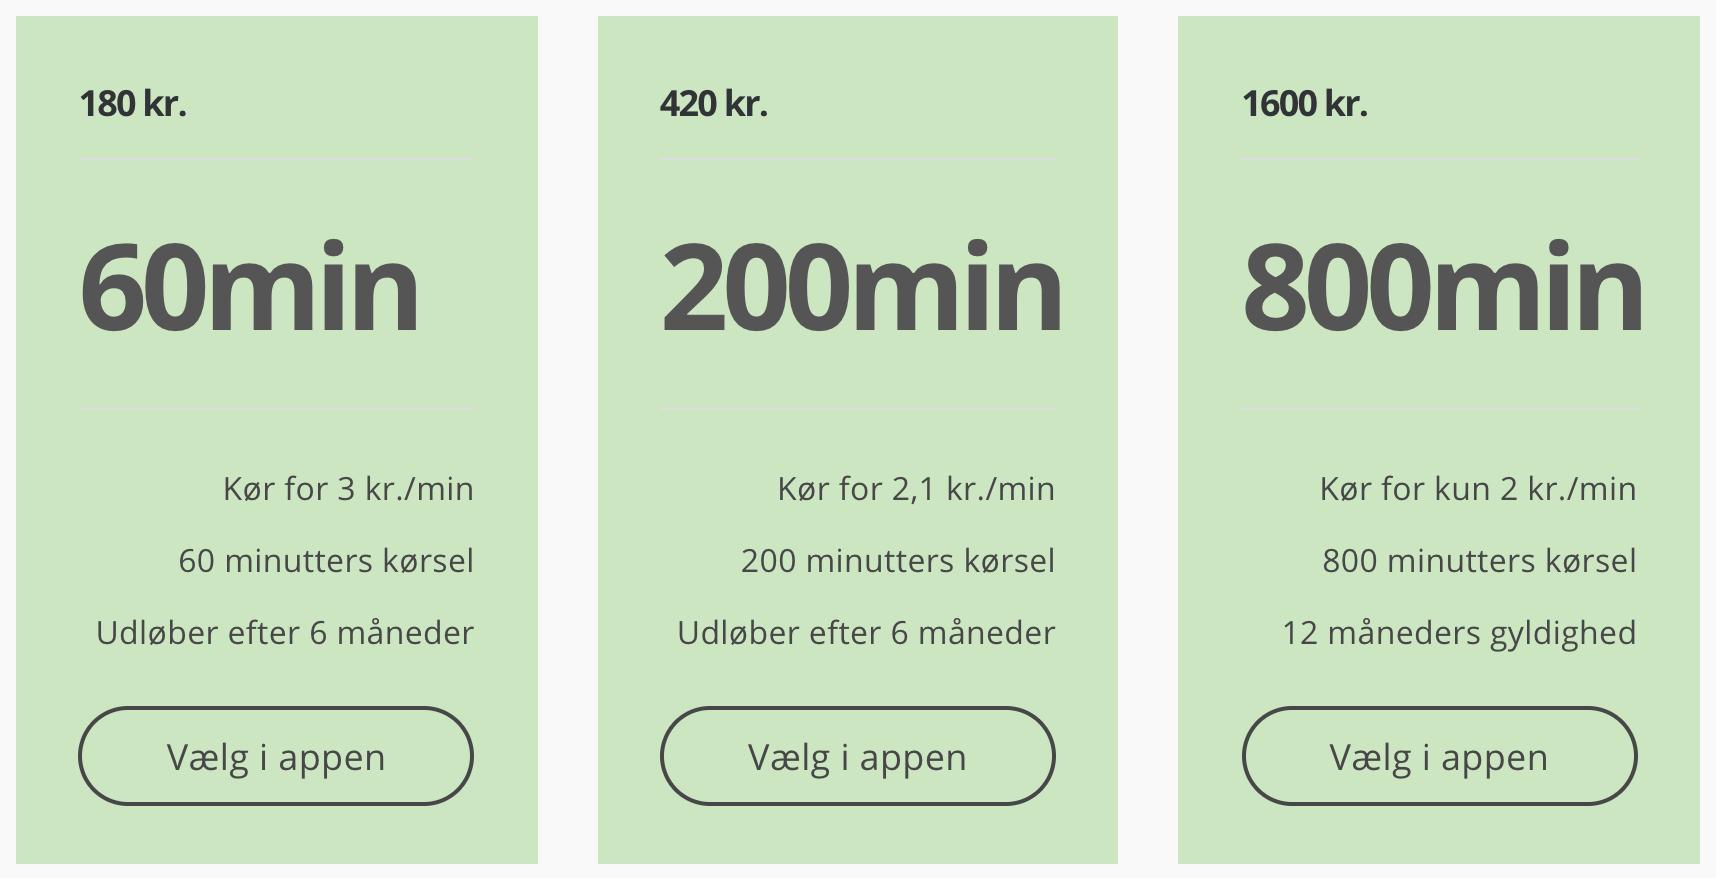 GreenMobility priser